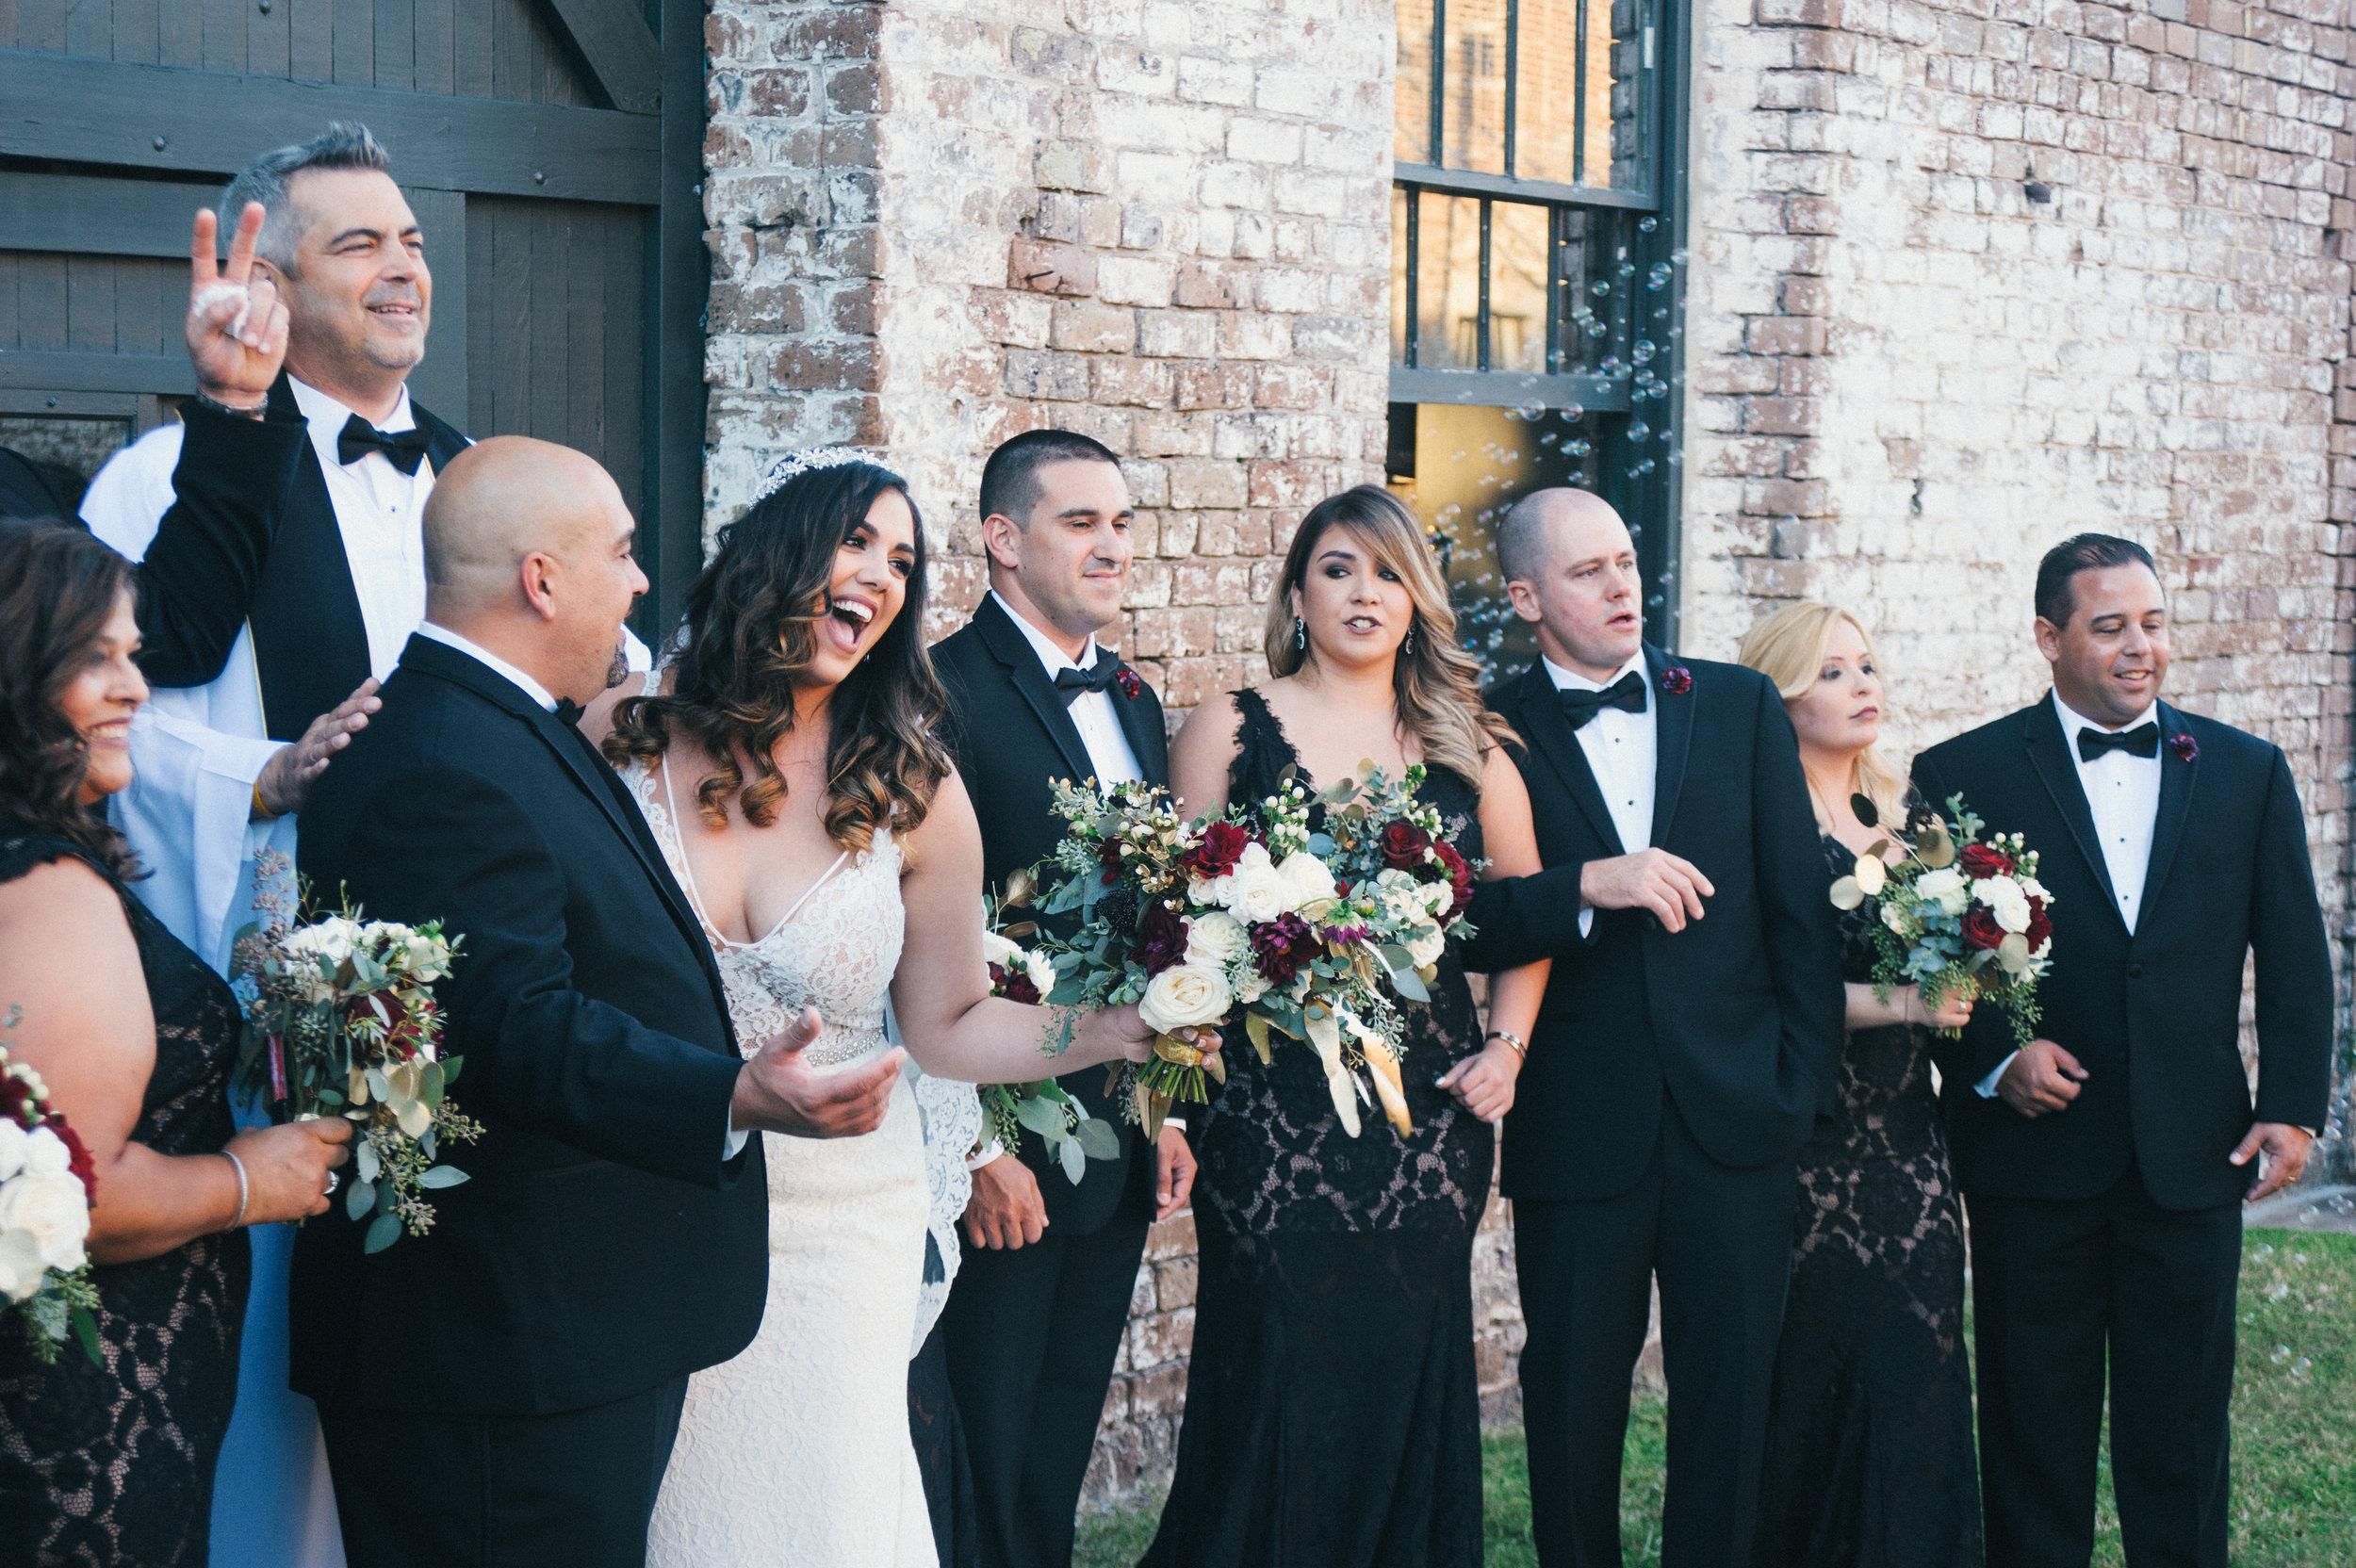 Iggy-and-yesenia-savannah-railroad-museum-wedding-meg-hill-photo- (557 of 866).jpg